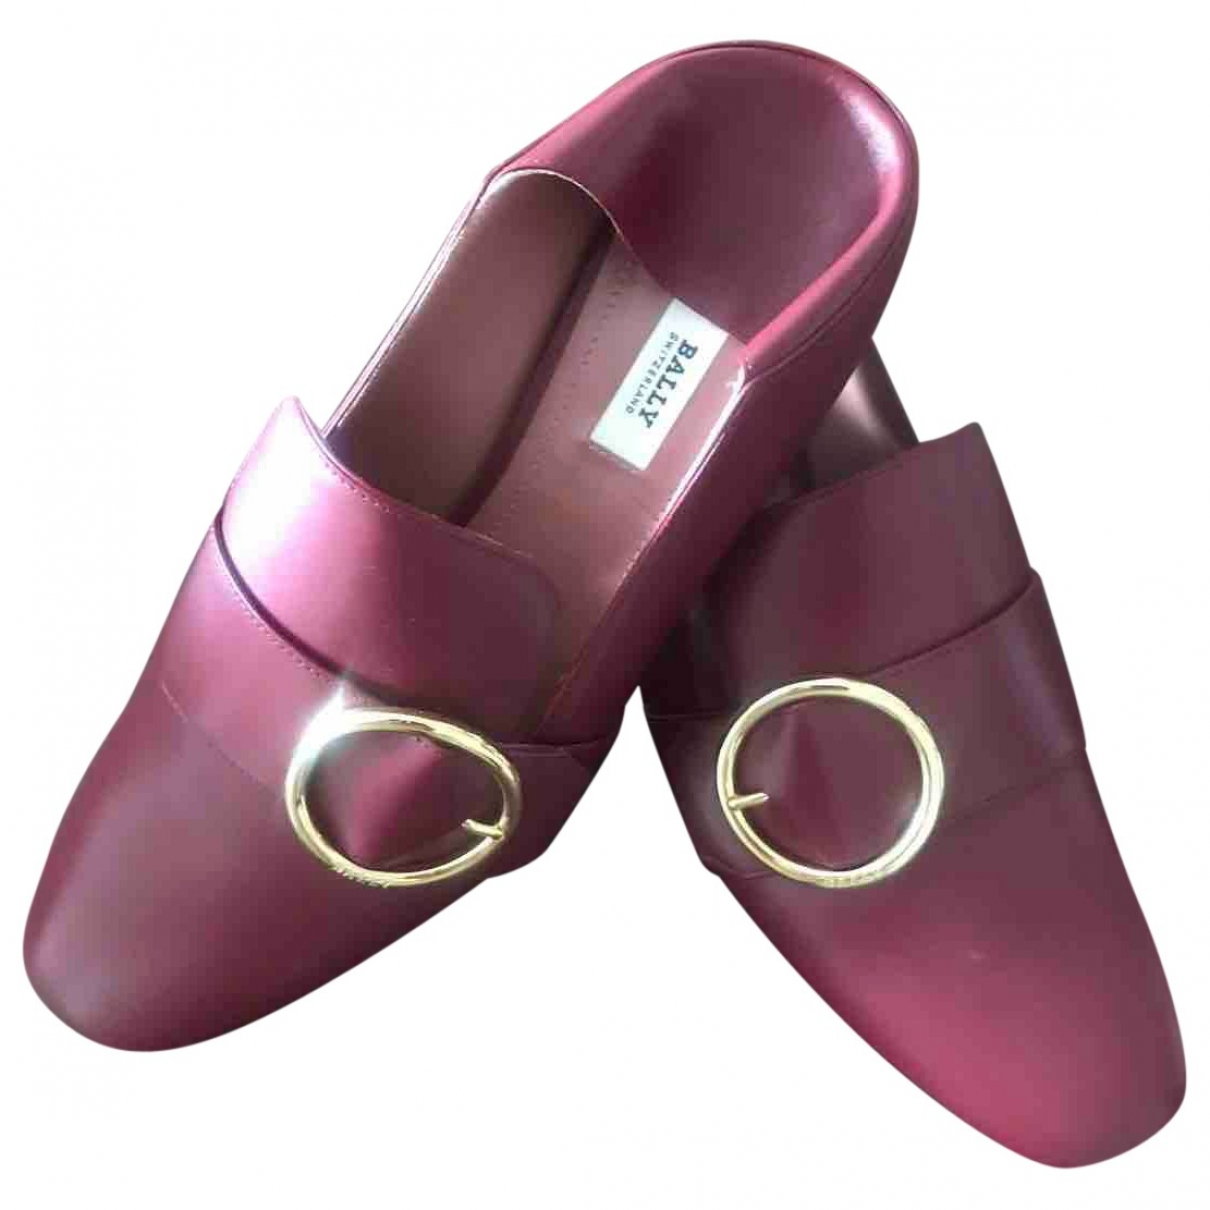 Bally \N Burgundy Leather Flats for Women 38 EU